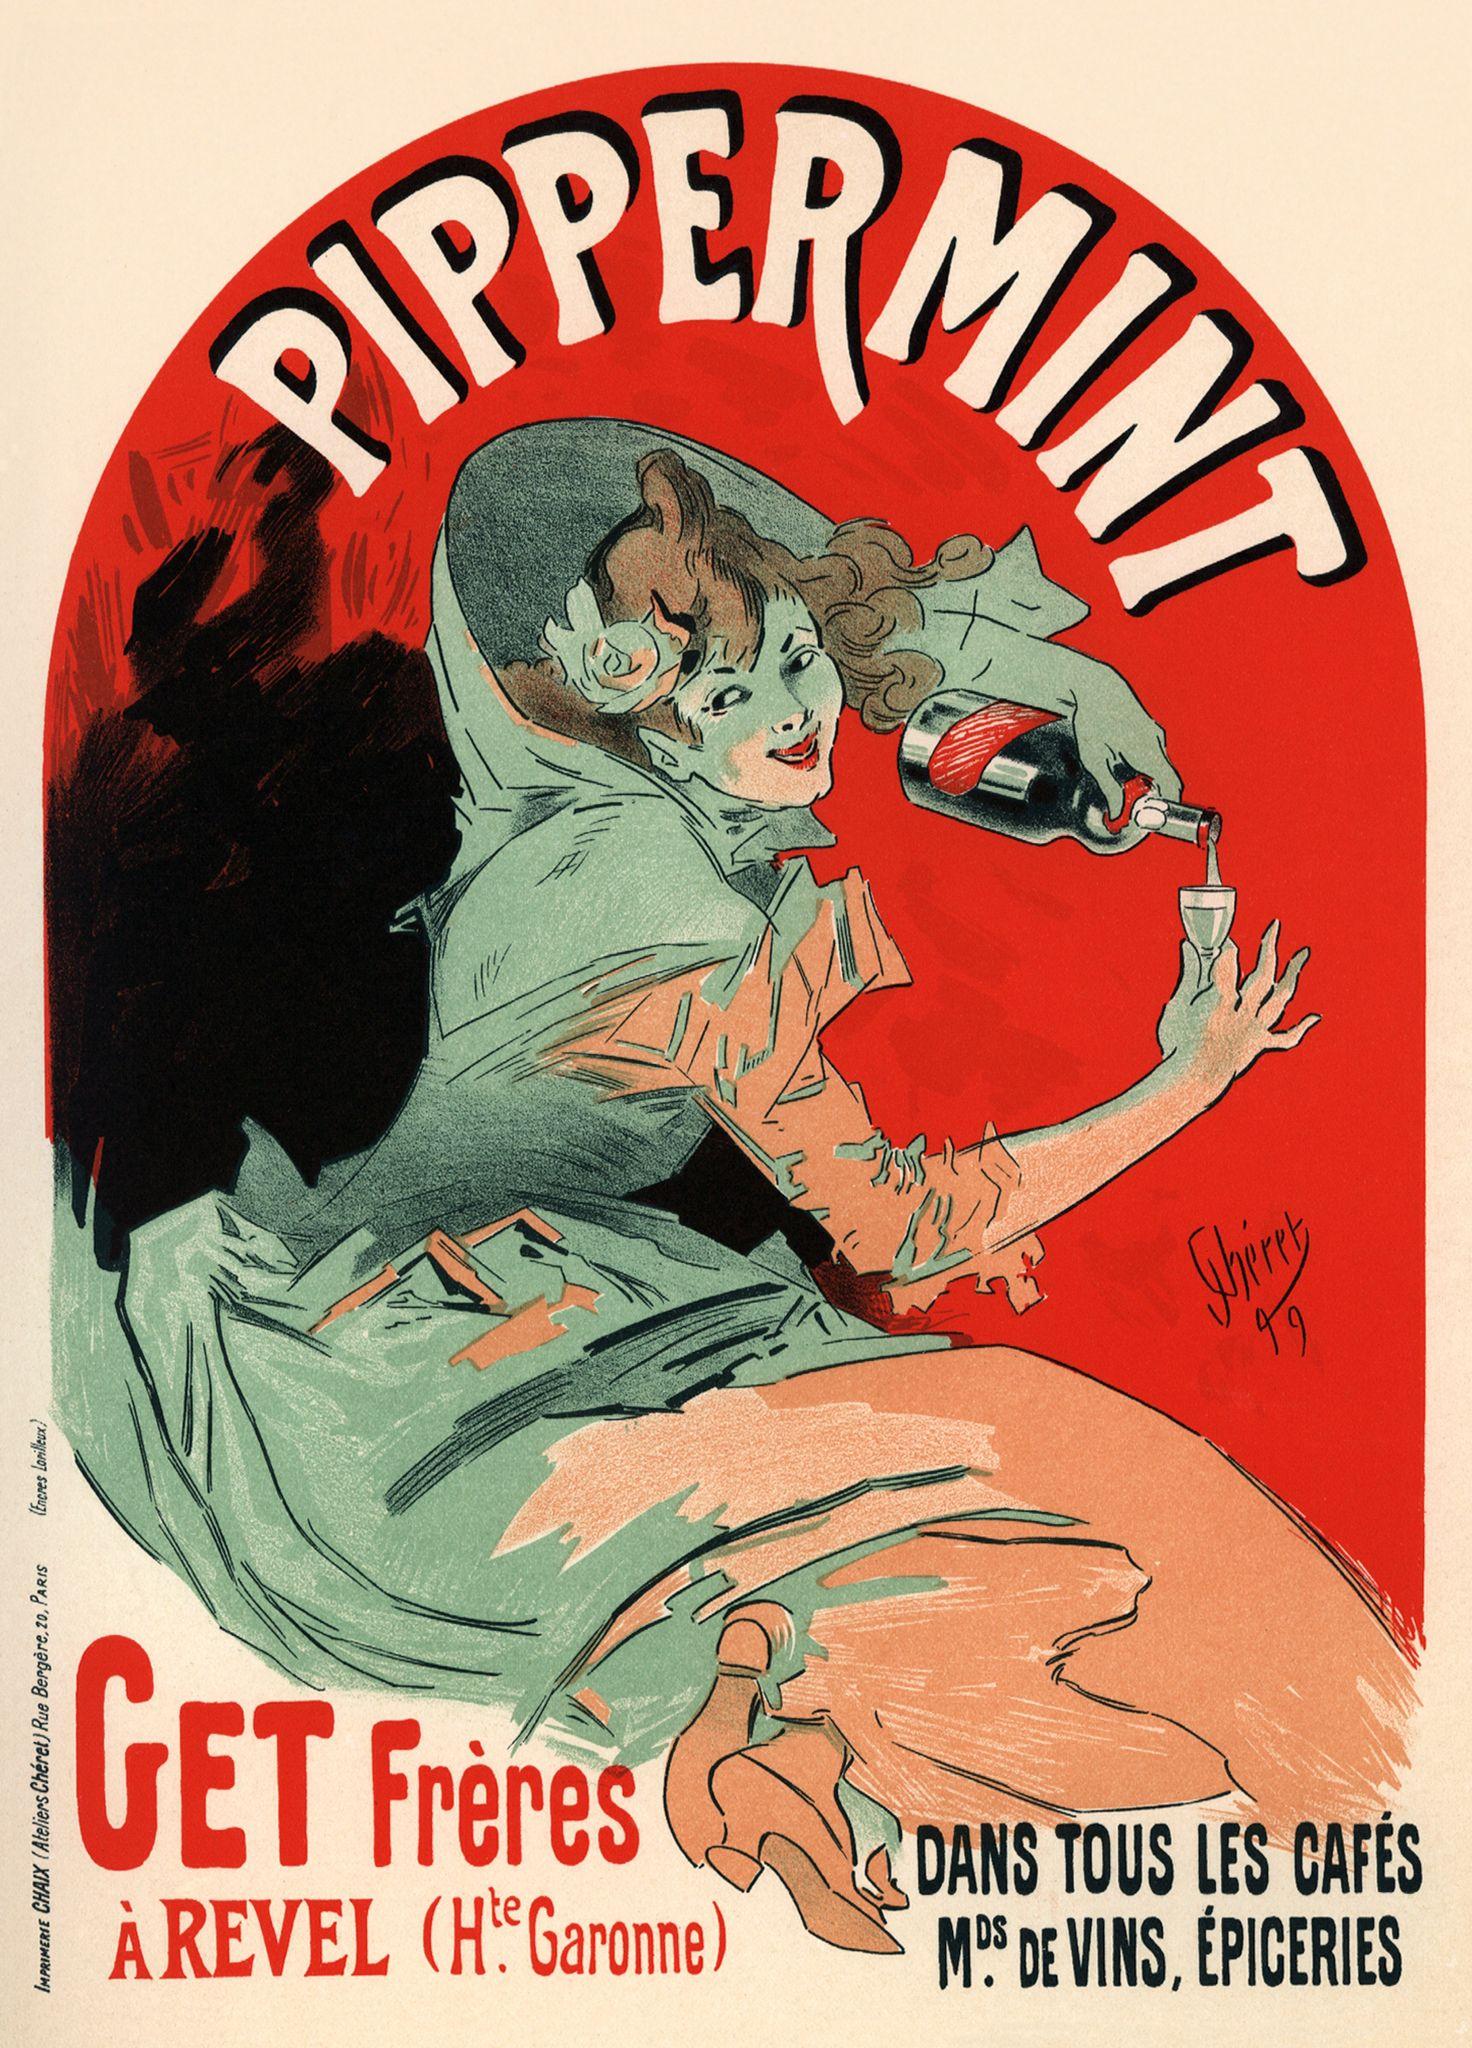 Peppermint Vintage Ads That Make Me Art Nouveau Poster Vintage Posters Vintage Wine